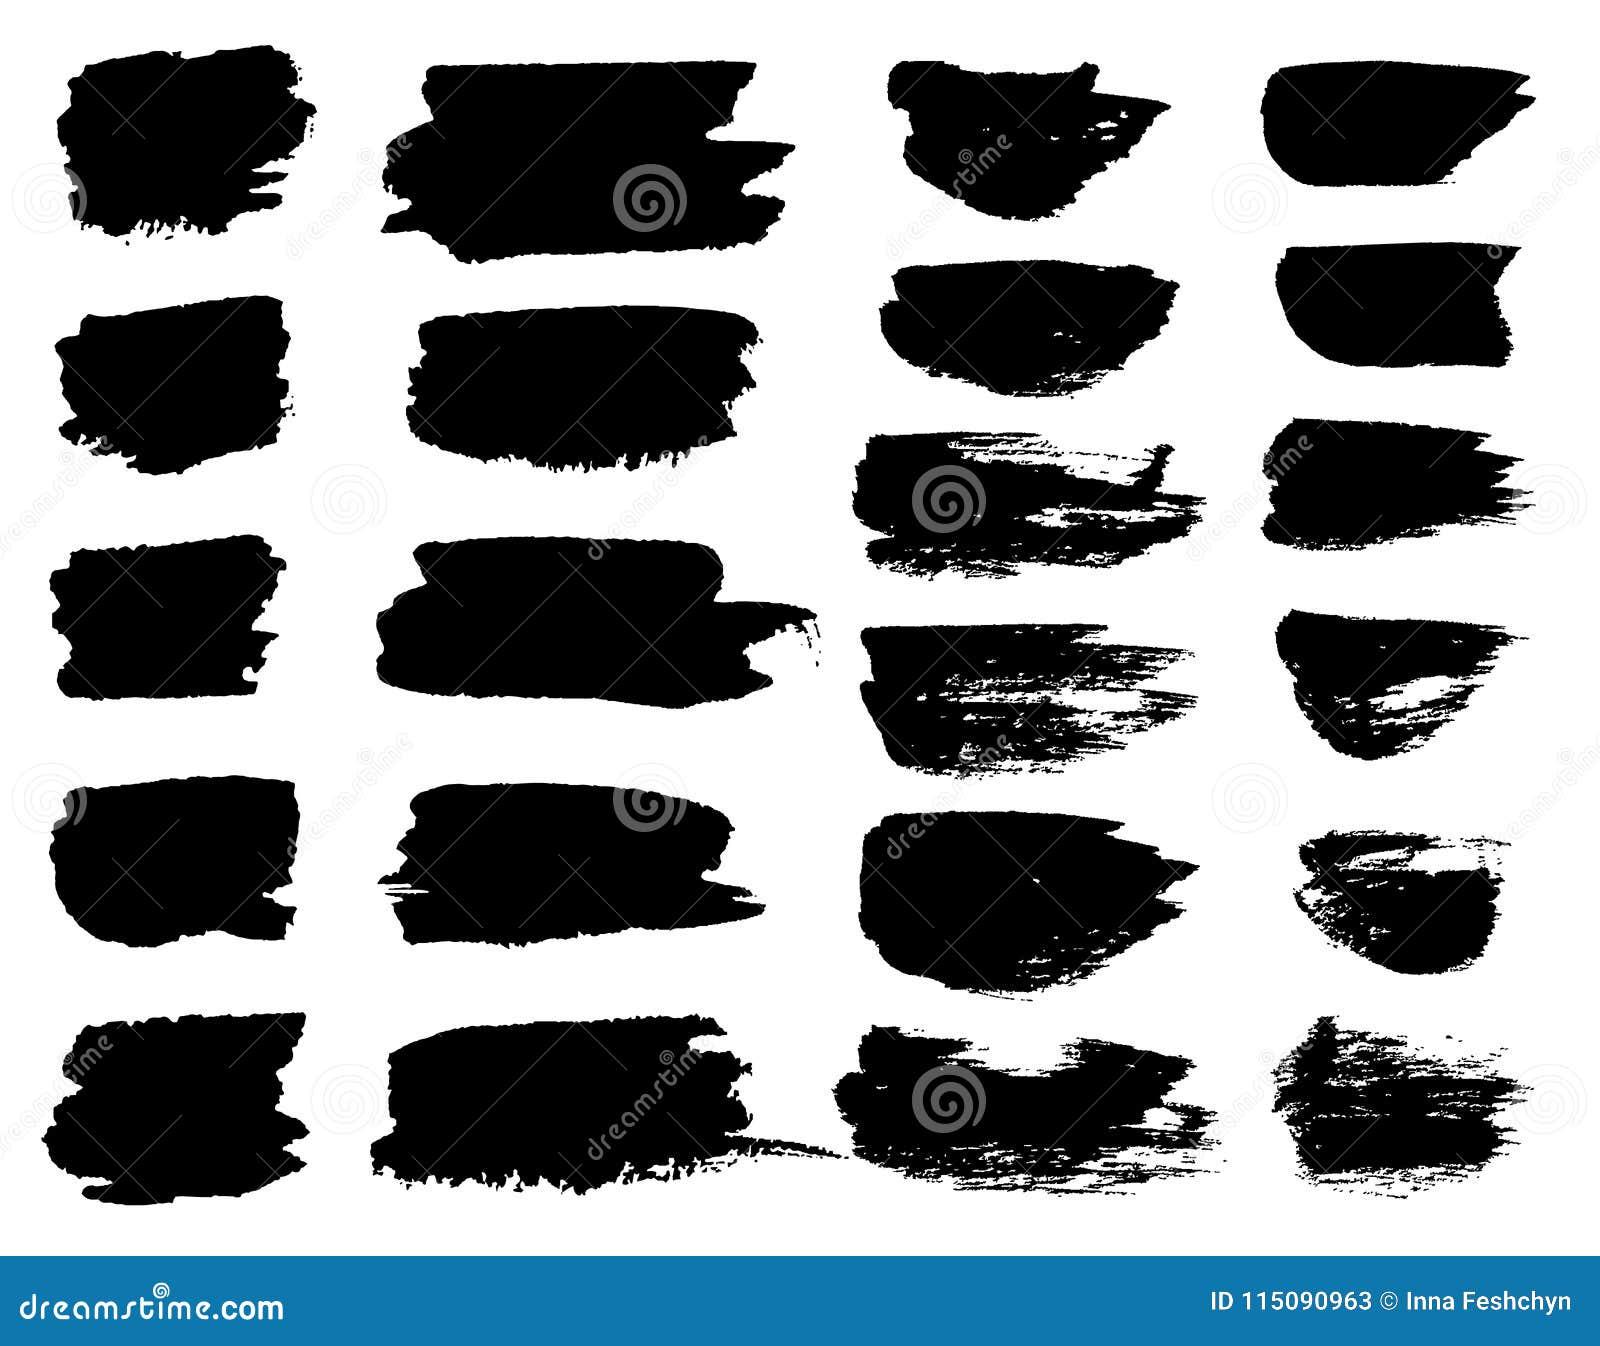 Vector black paint brush spots, highlighter lines or felt-tip pen marker horizontal blobs. Marker pen or brushstrokes